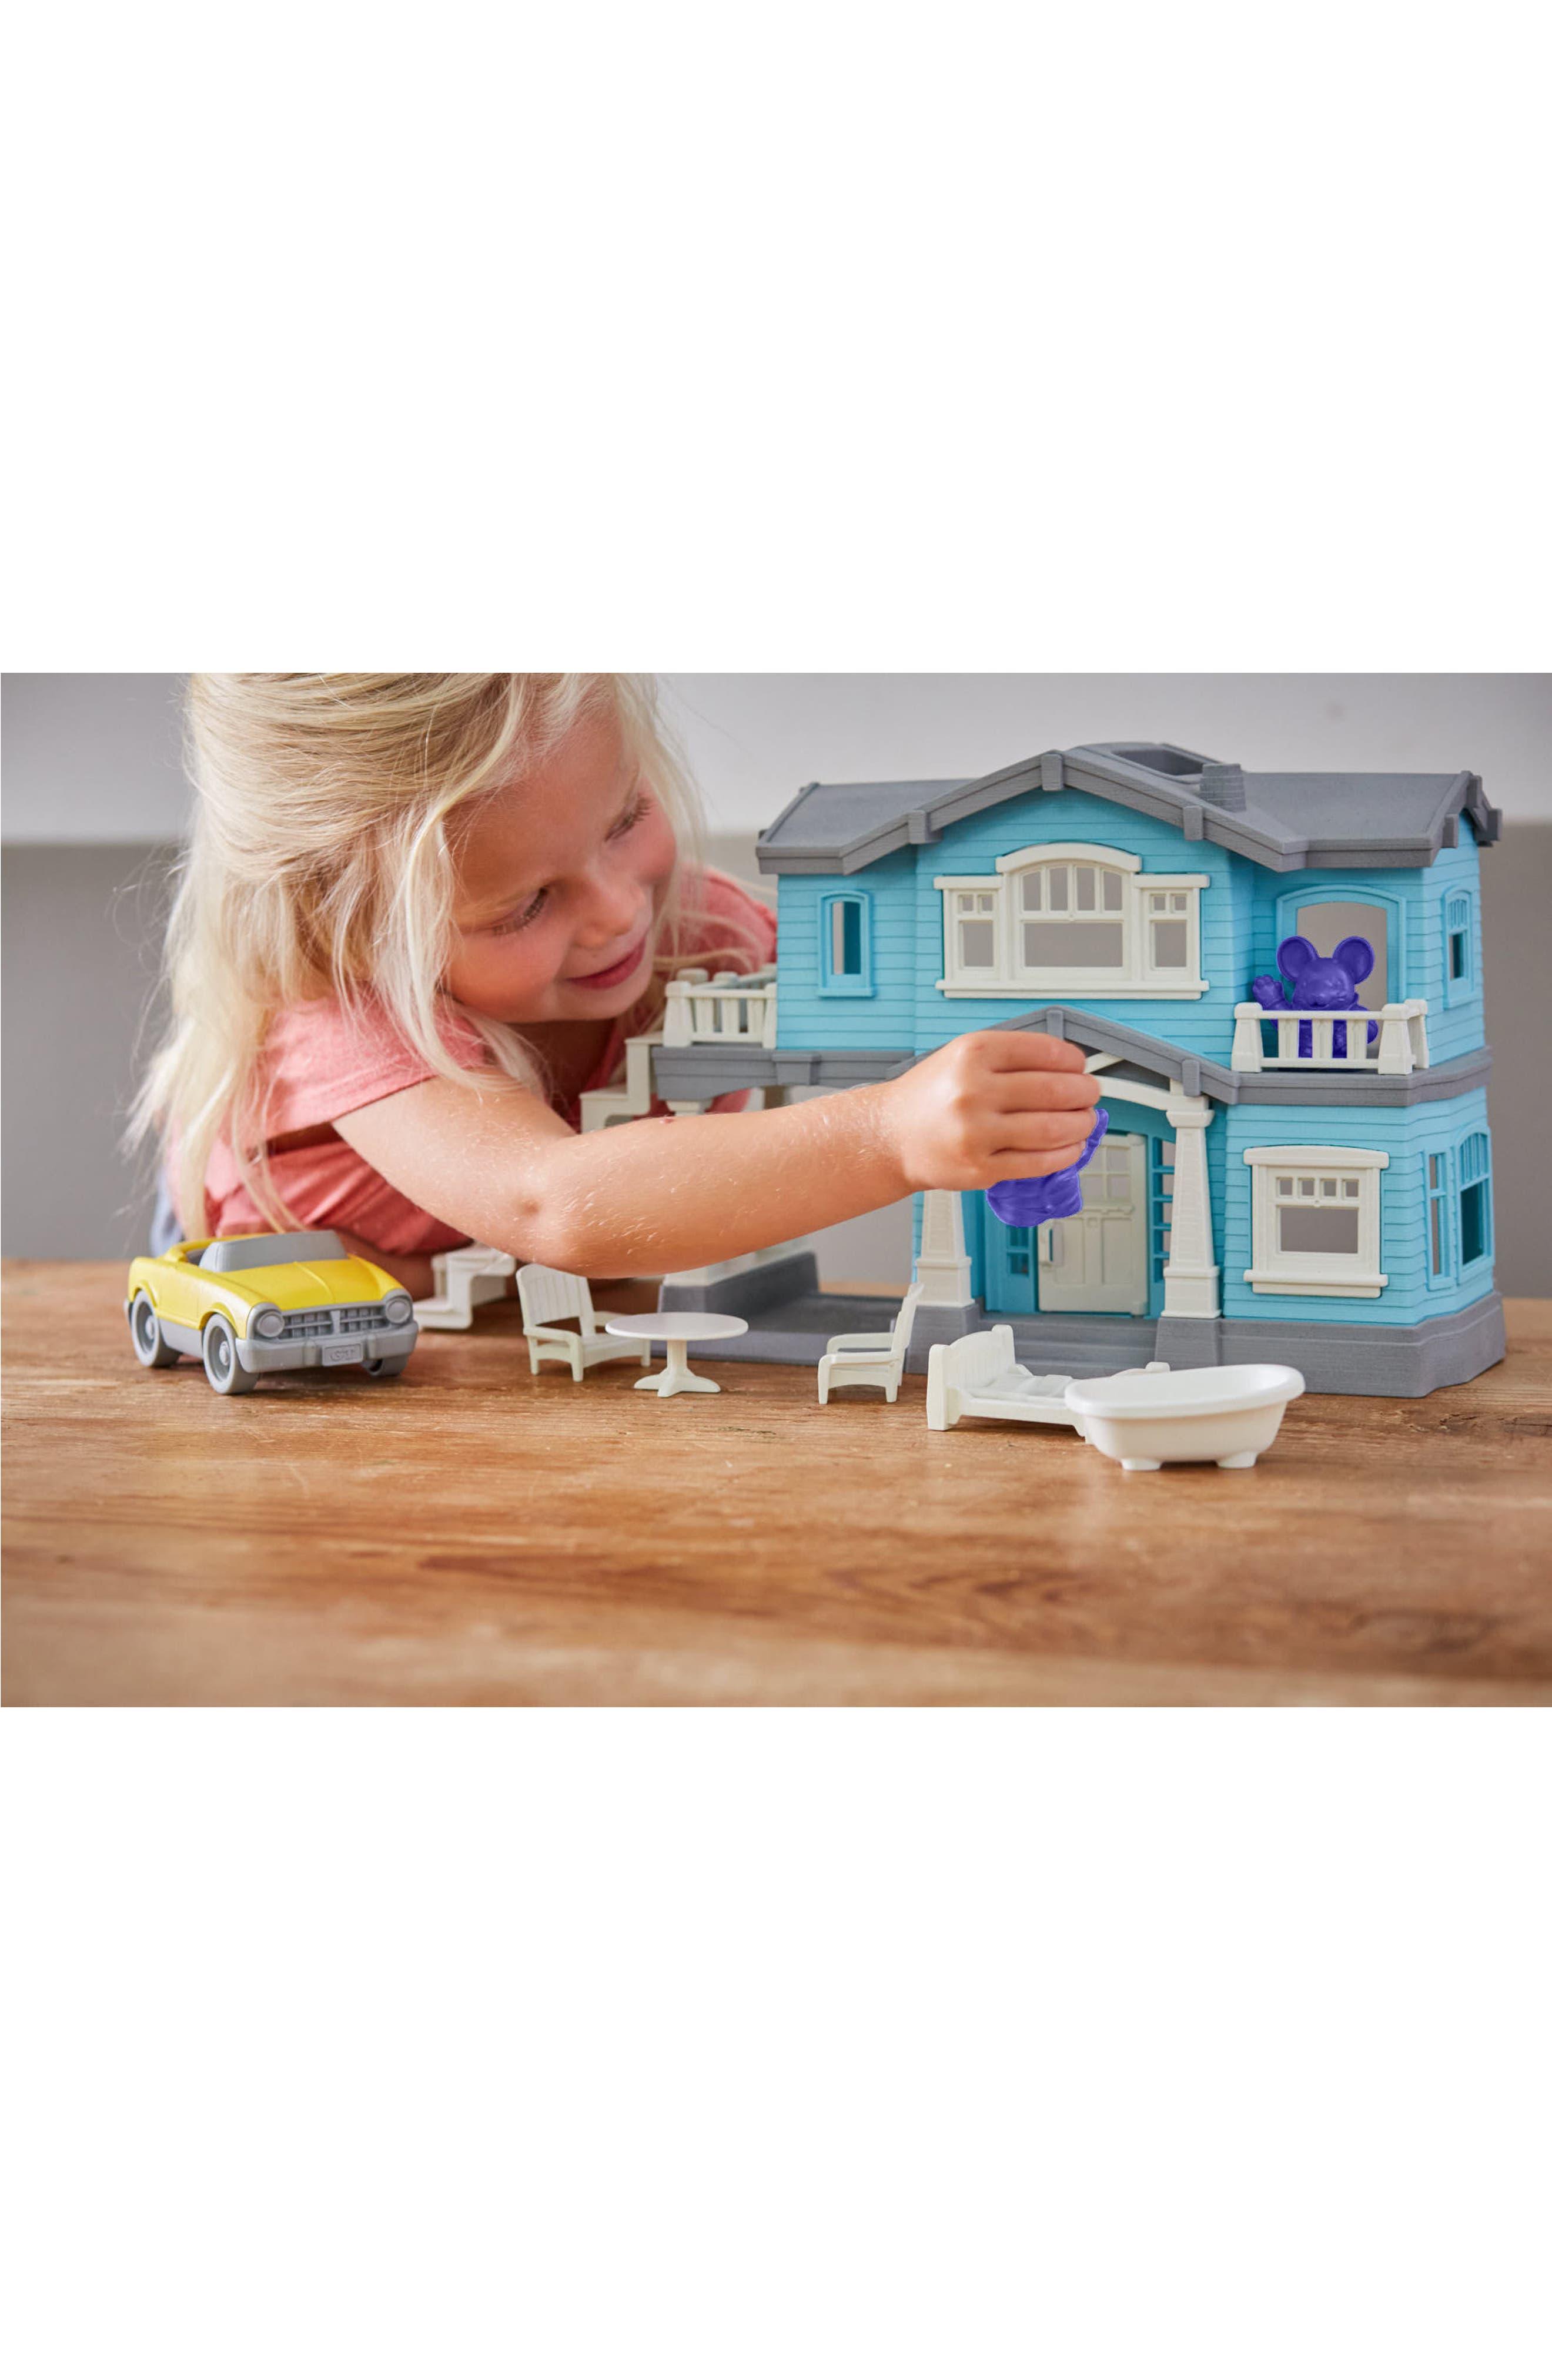 10-Piece House Play Set,                             Alternate thumbnail 7, color,                             450